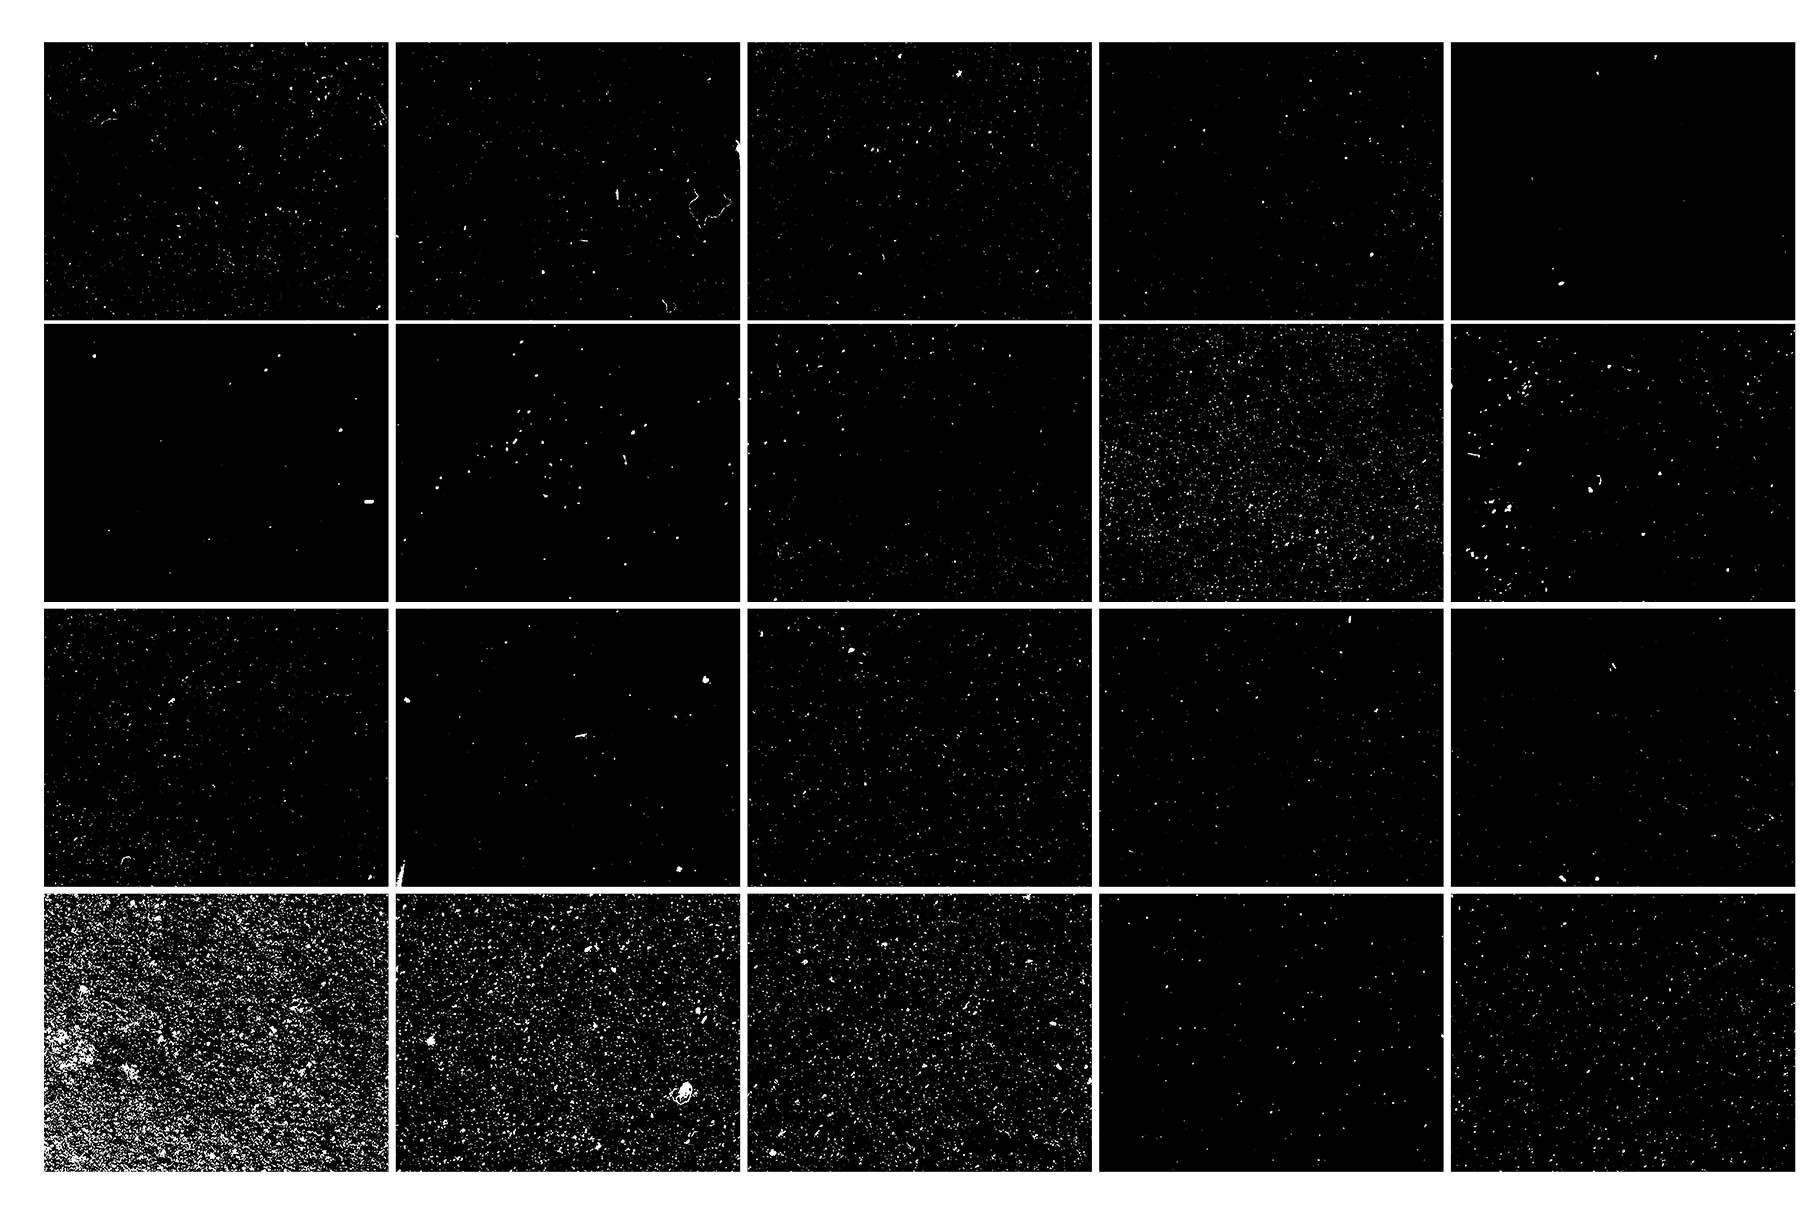 Film Grain Dust Texture Overlay By Freeject Net On Creativemarket Photo Overlays Texture Overlays